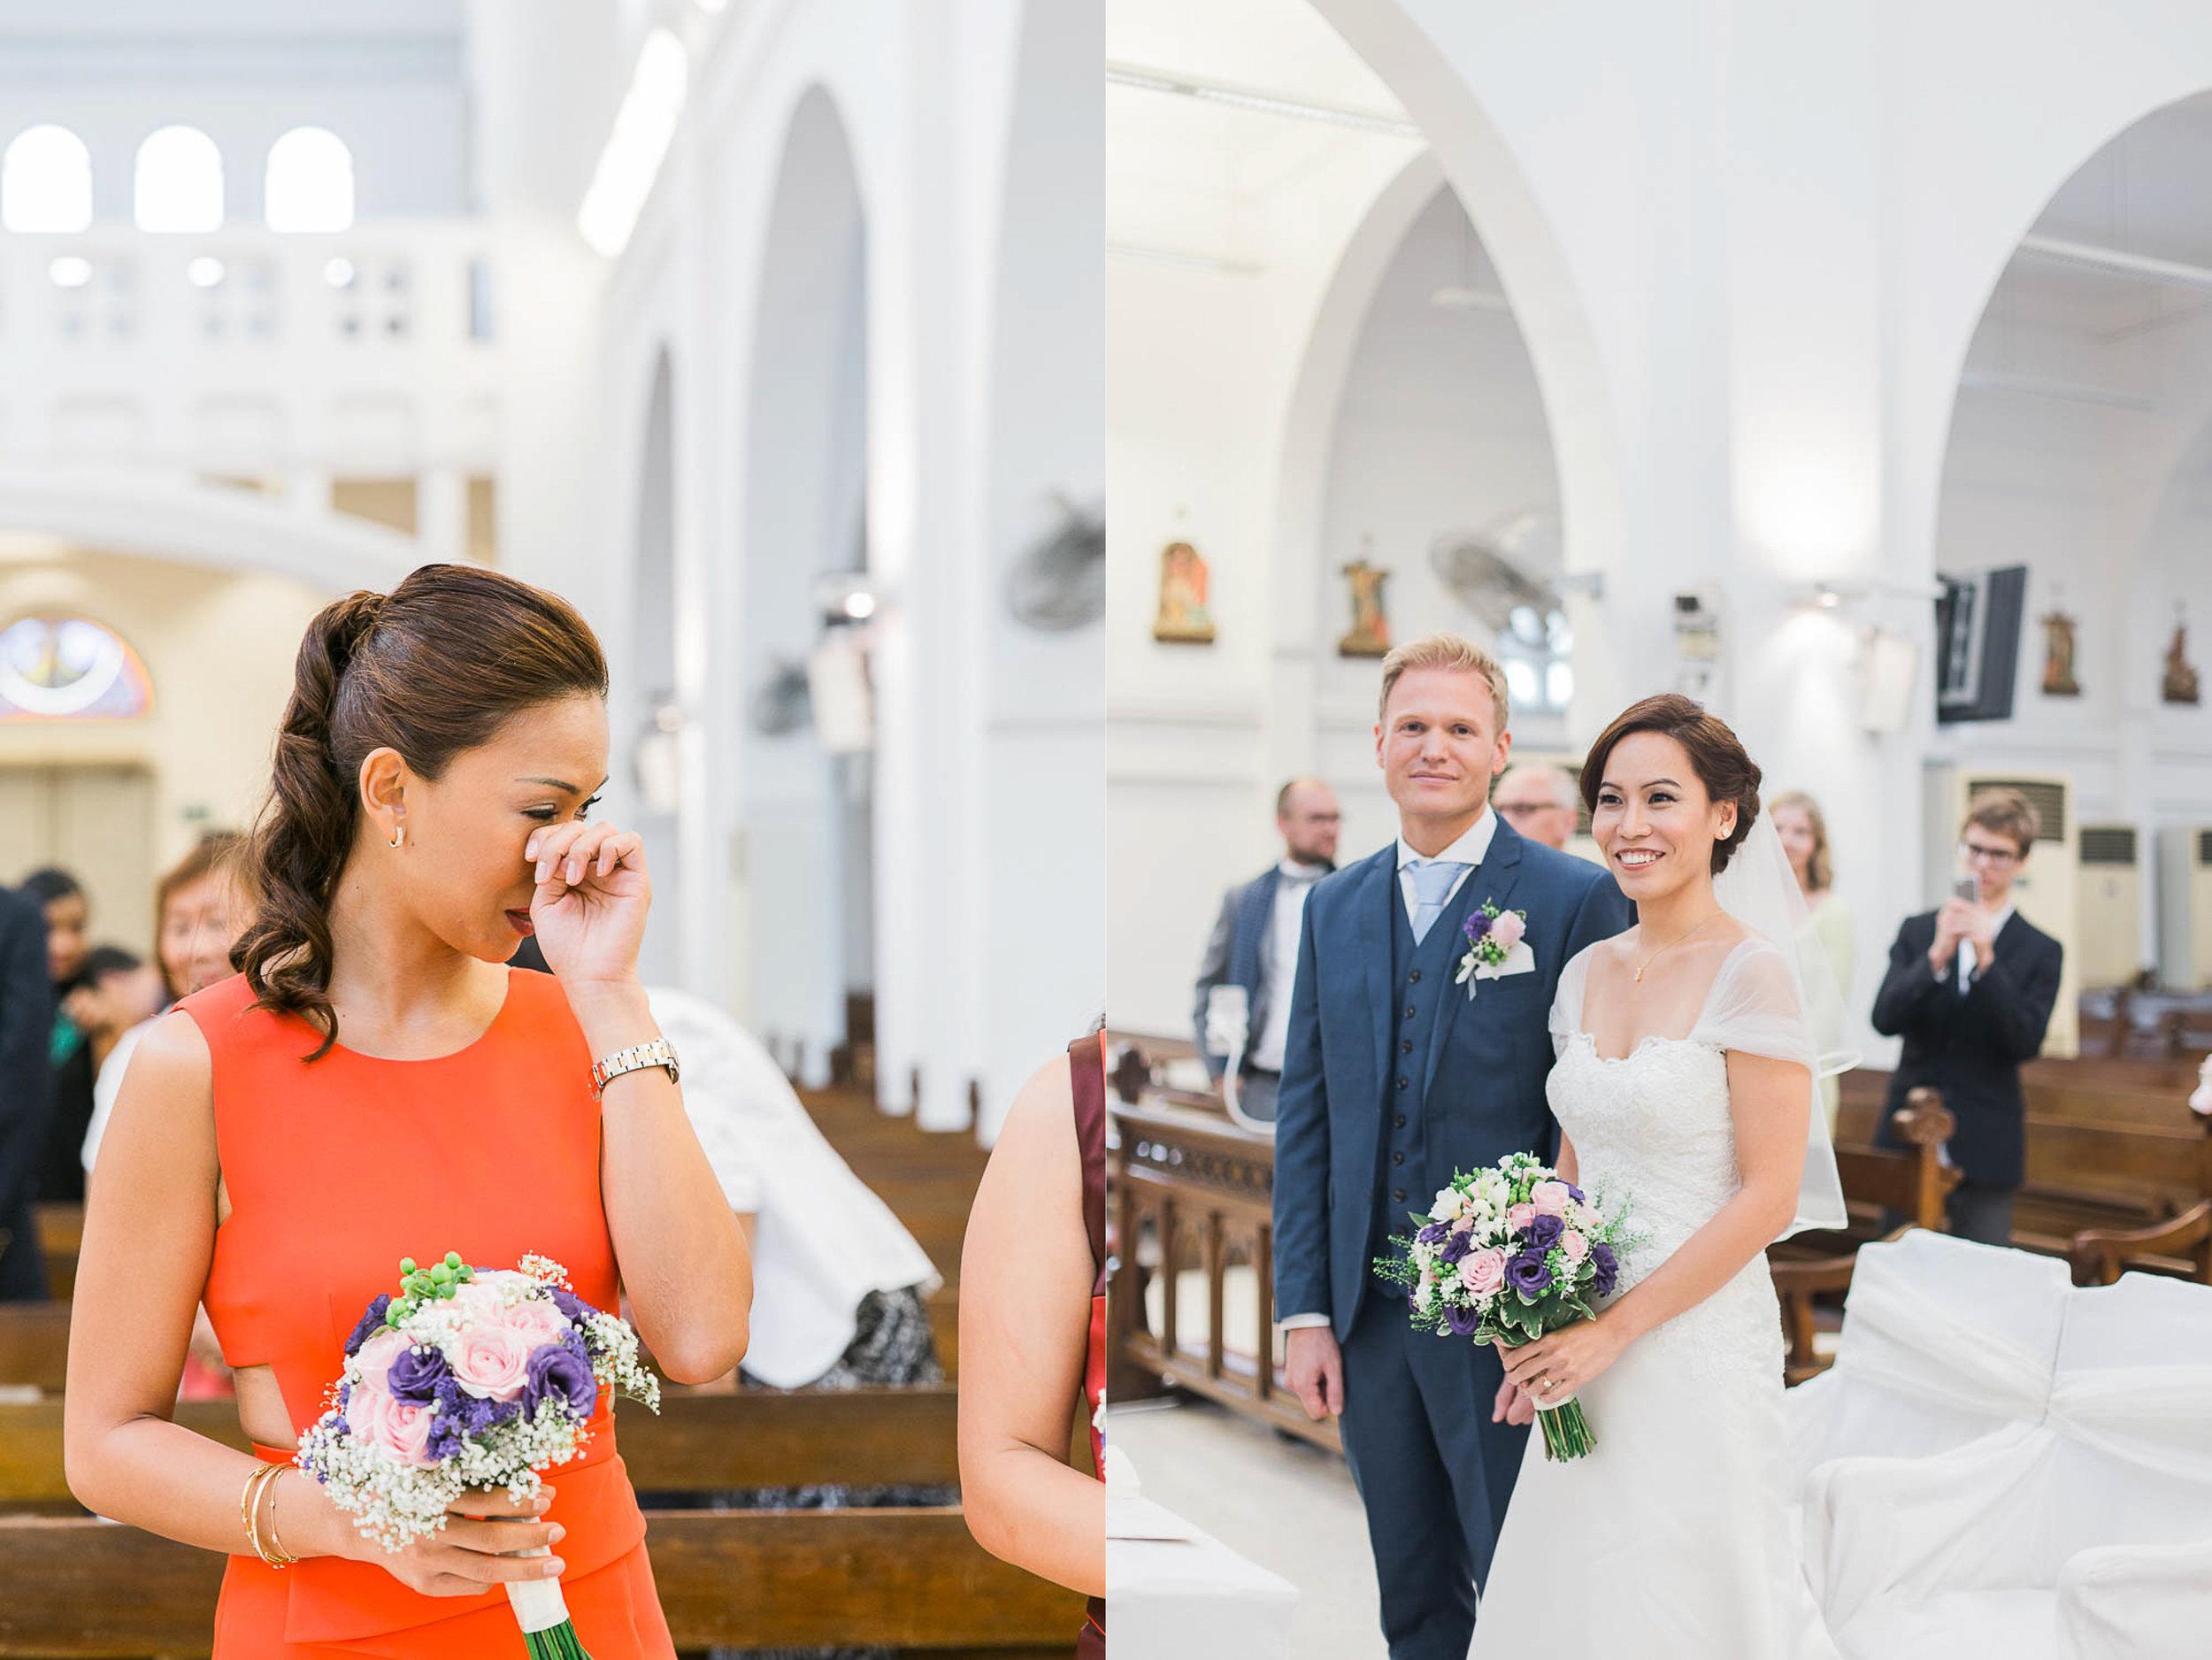 wedding-photographer-singapore-film-photographer-chen-sands-Anglea-wedding-4-1.jpg